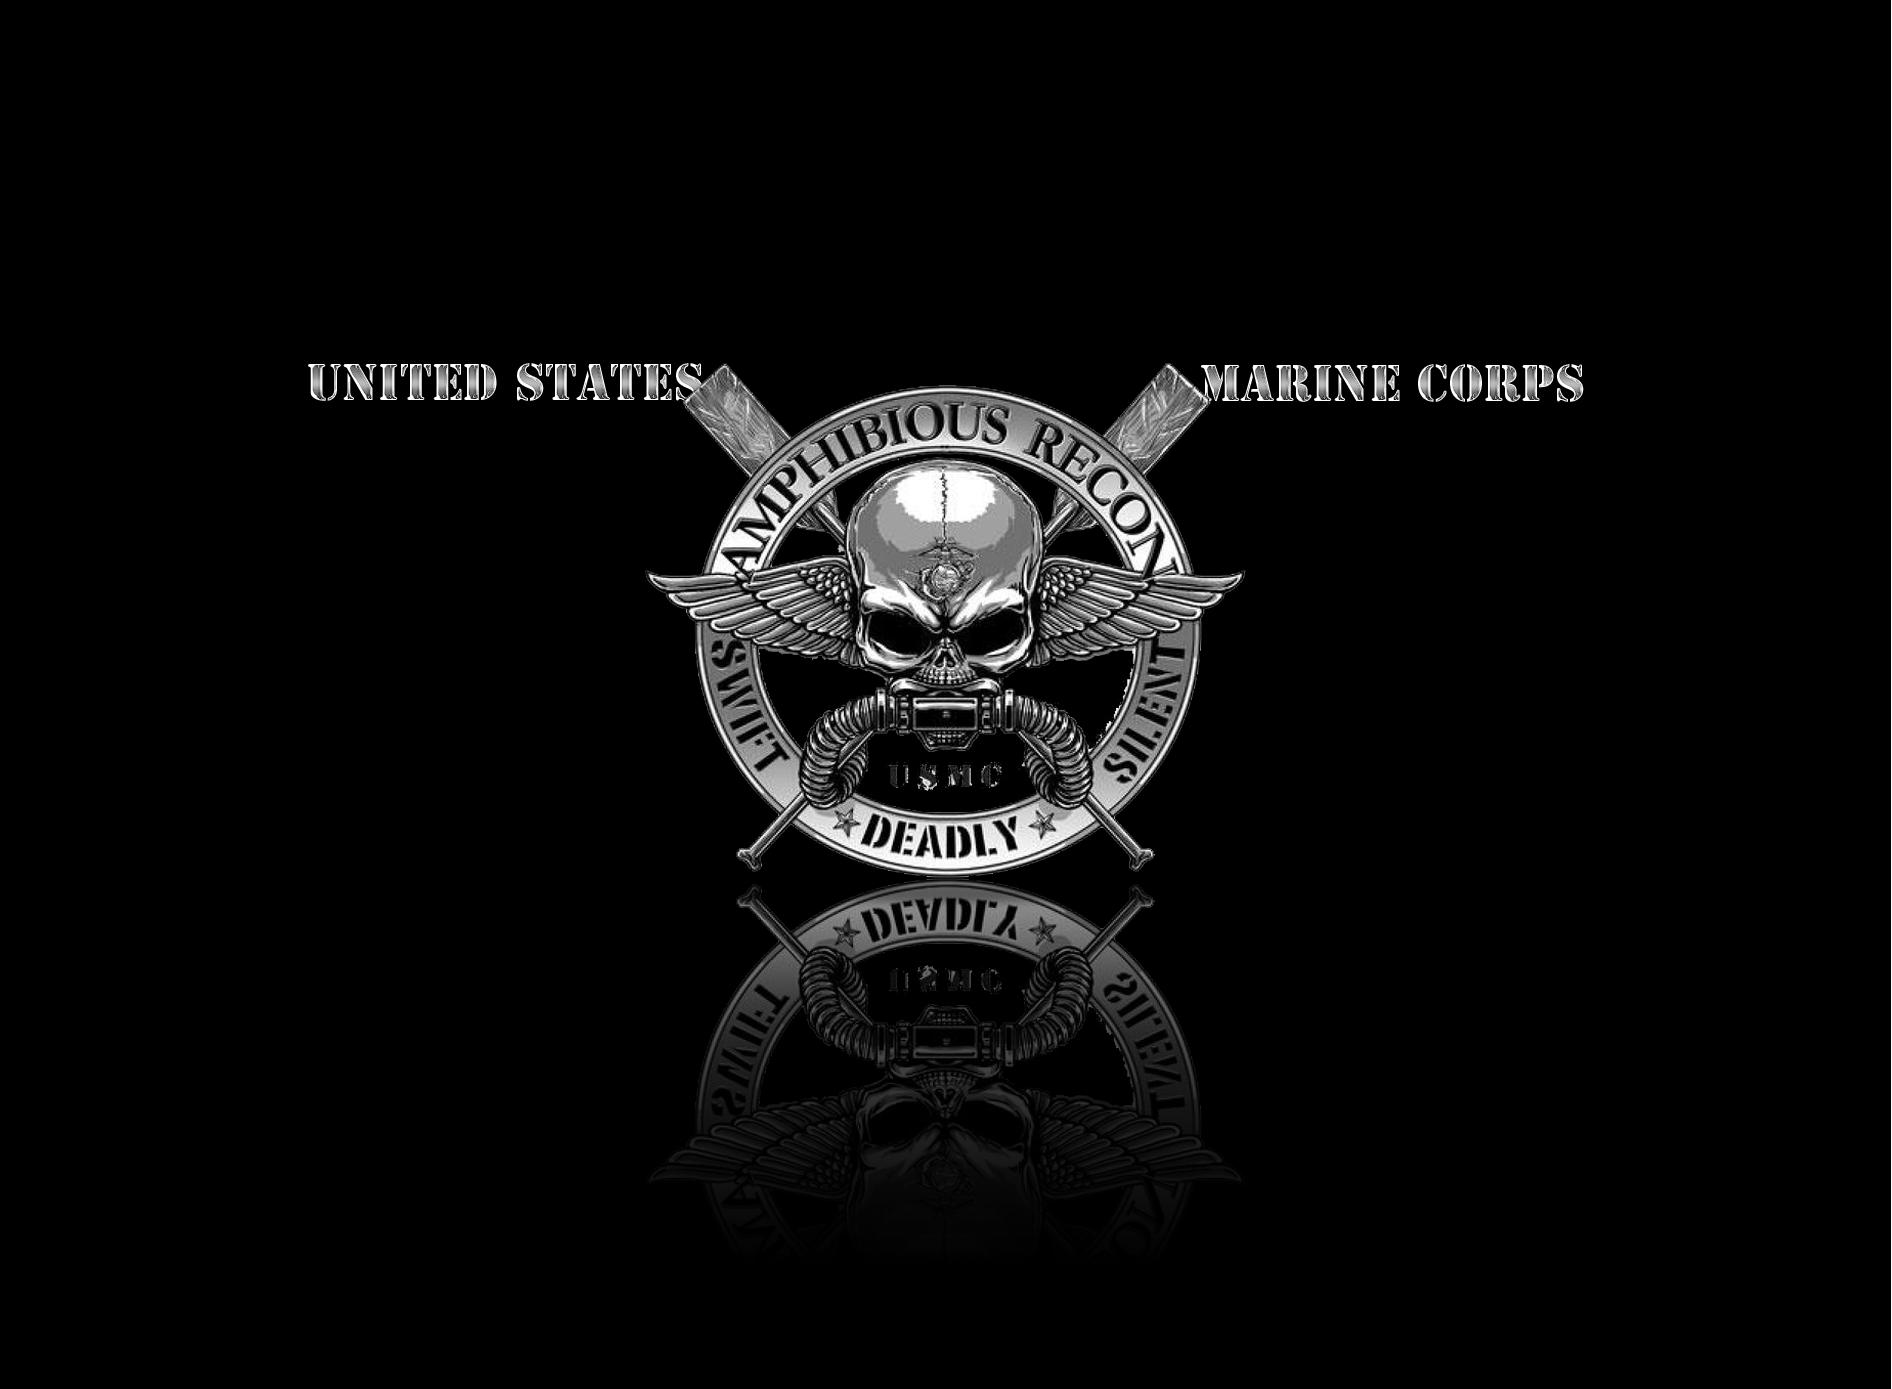 marine logo wallpaper 04 - photo #25